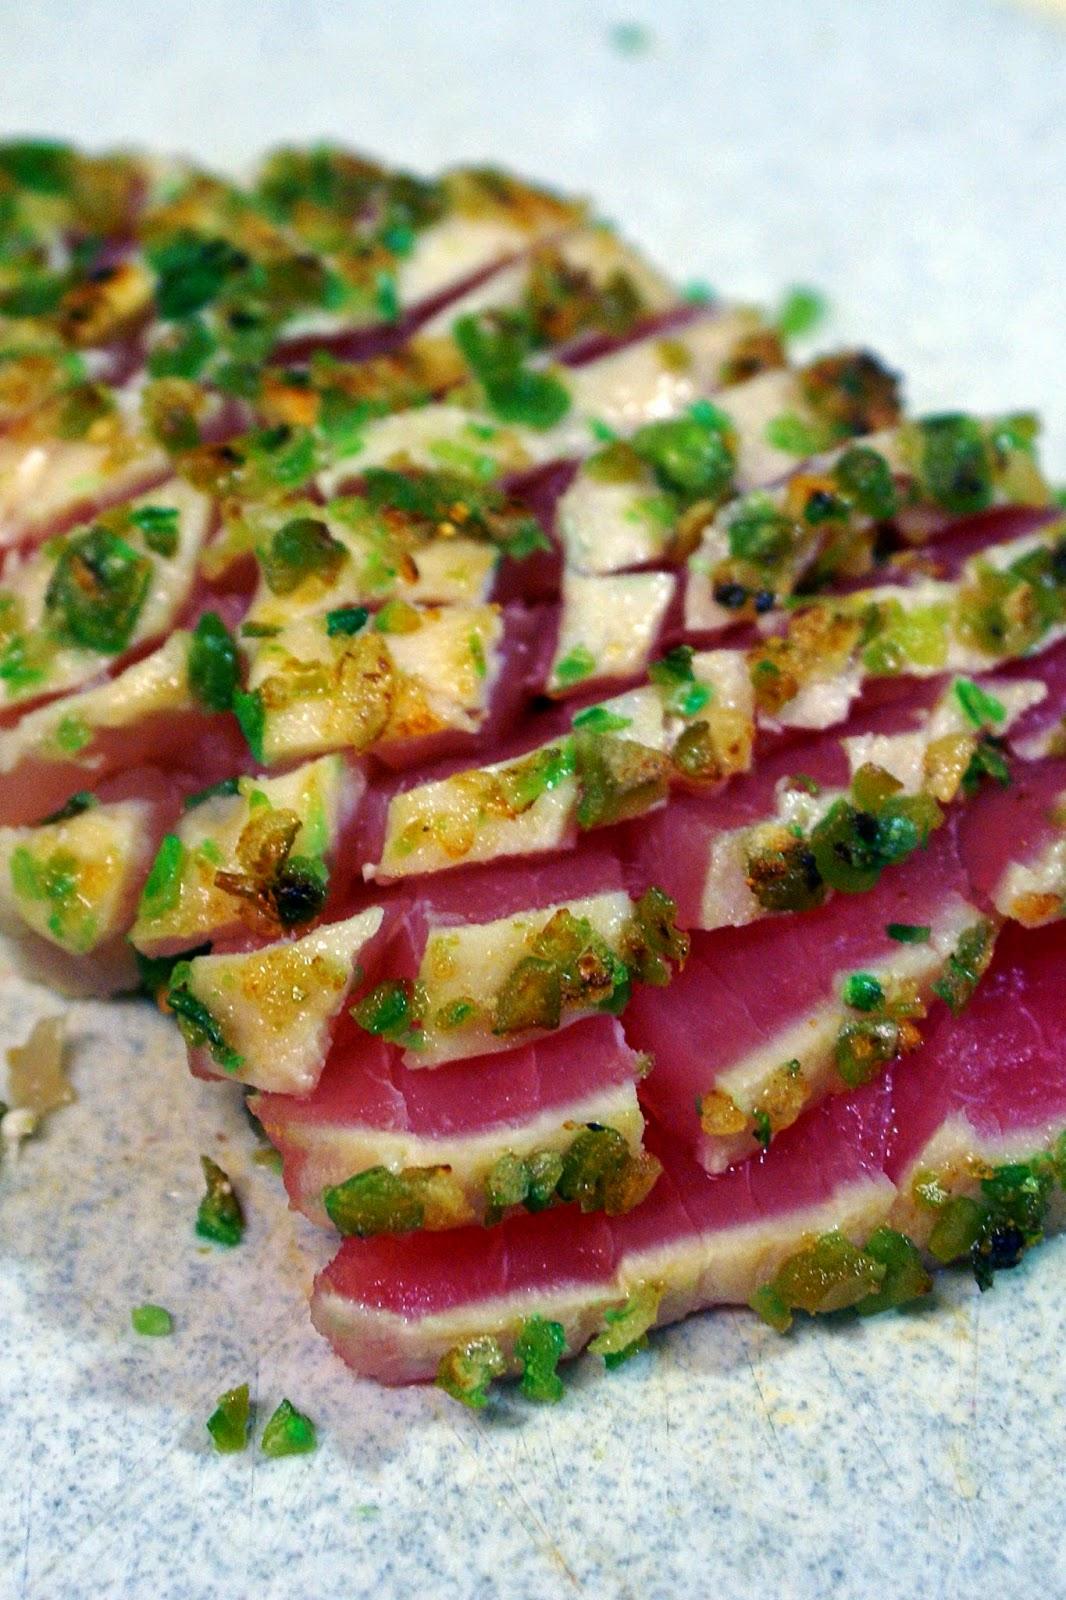 Seared Ahi Tuna with Wasabi Pea Crust